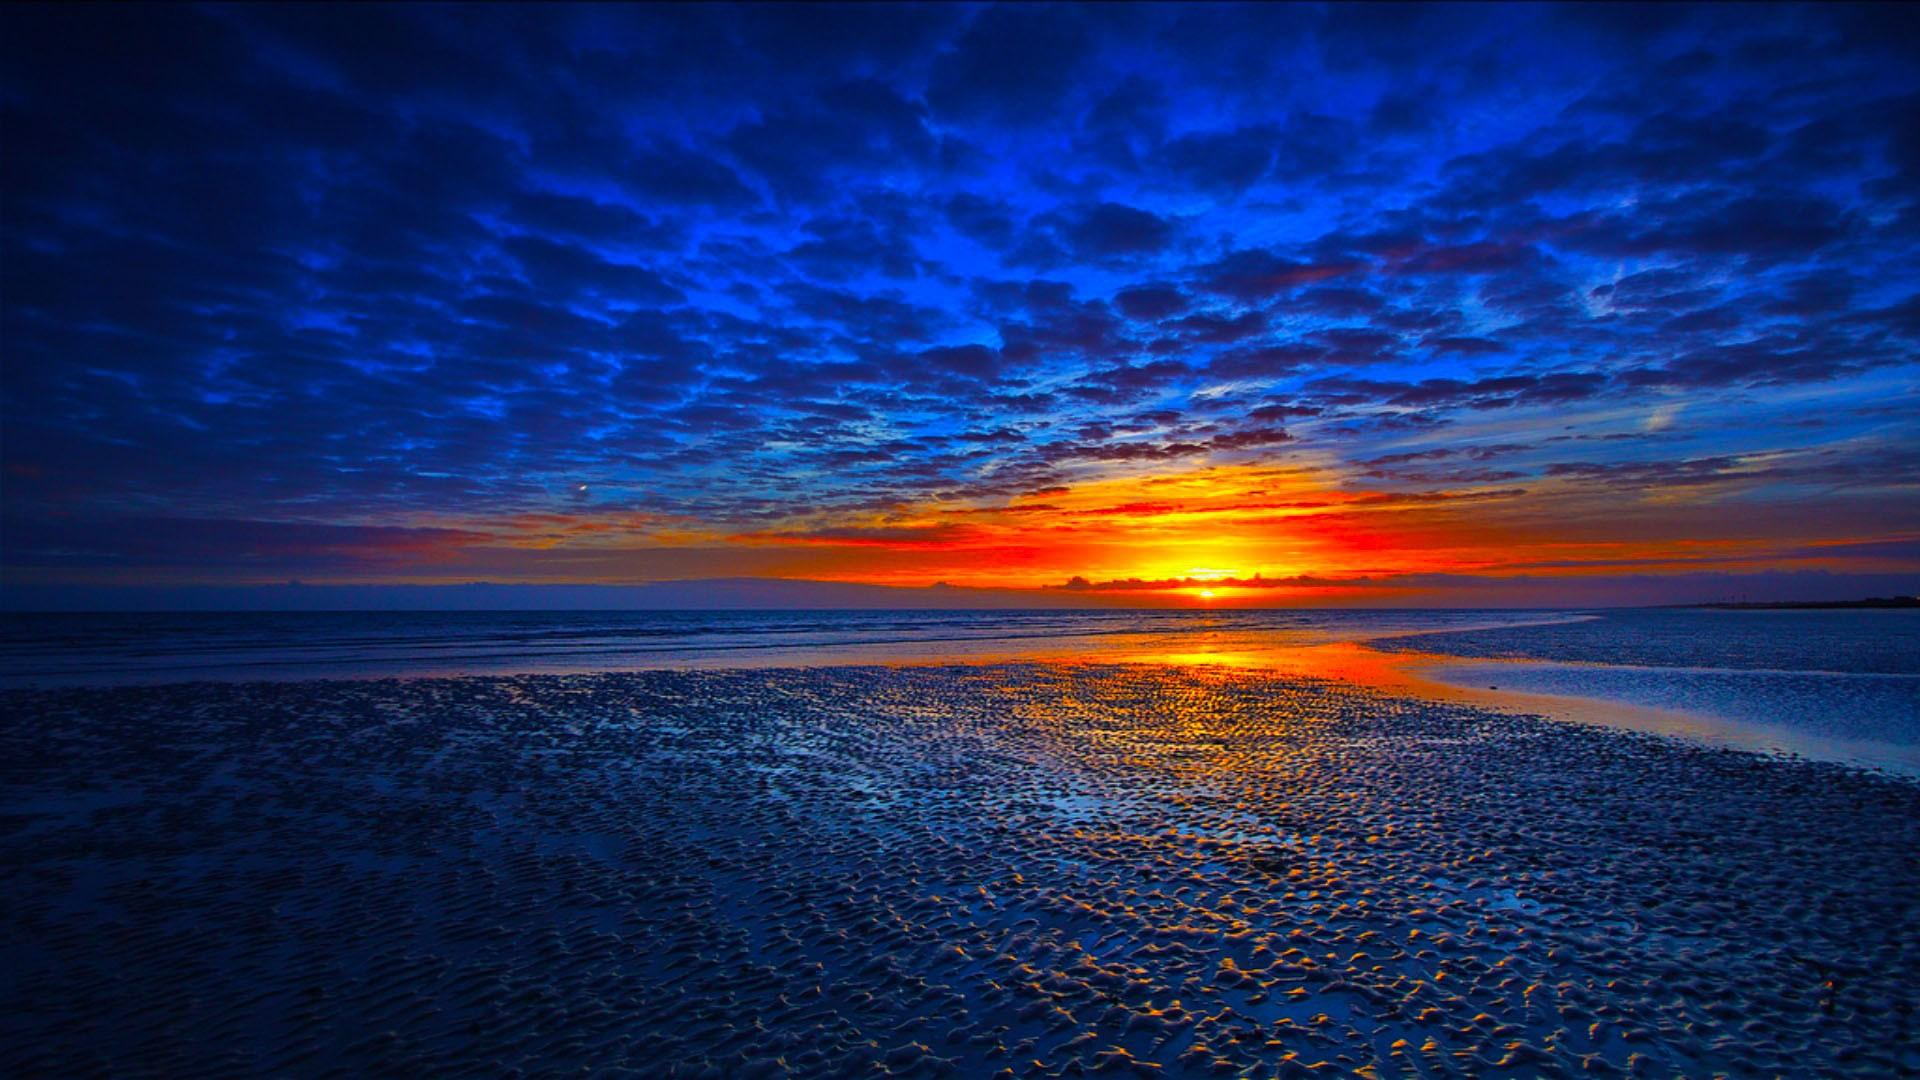 1080p blue sunset background wallpaper hd 1920x1080 1080p 1920x1080